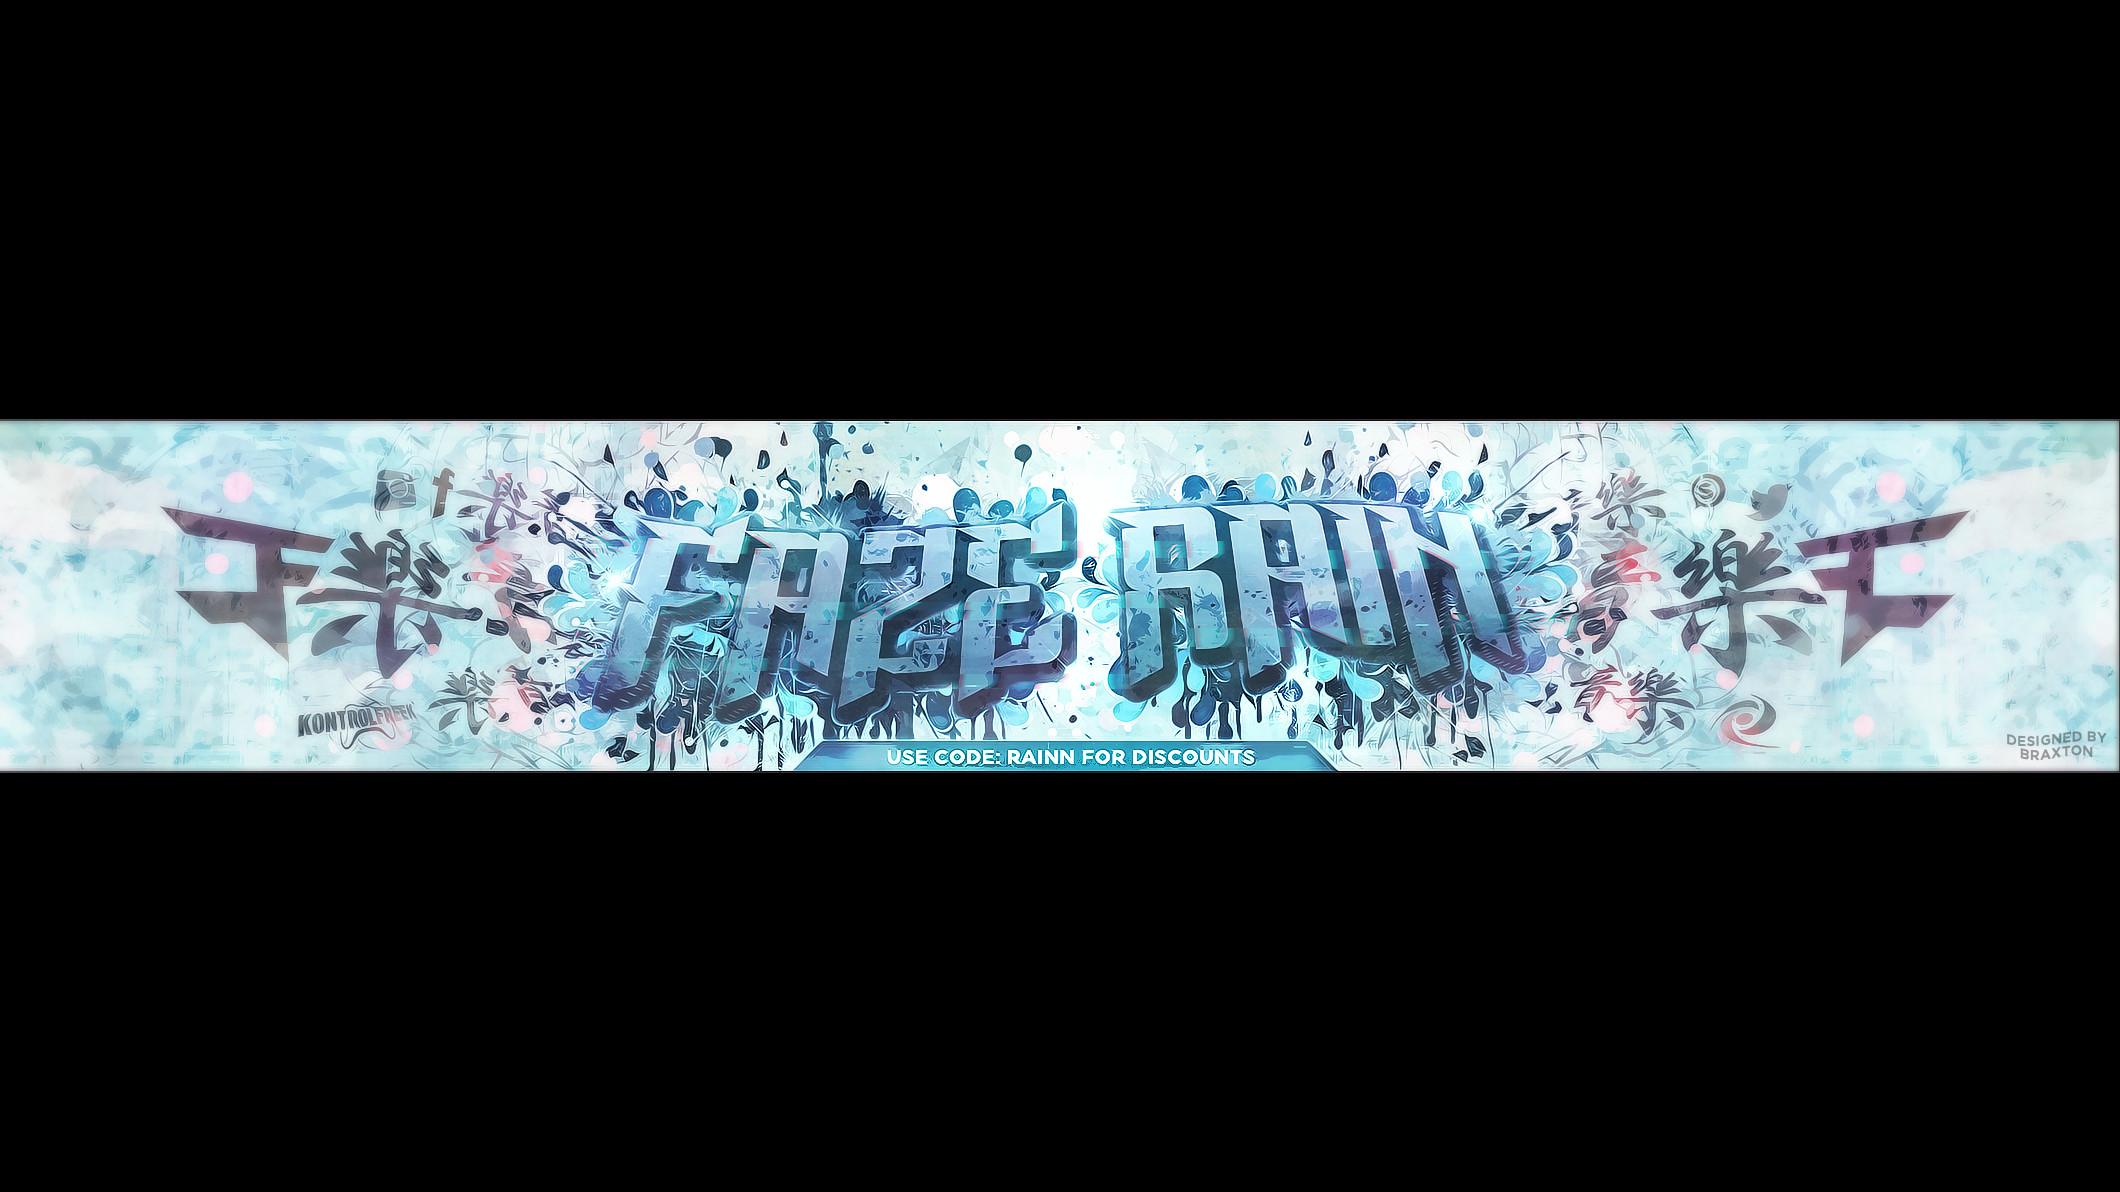 Mlg Hd Wallpaper Faze Clan 1080p Wallpaper 91 Images